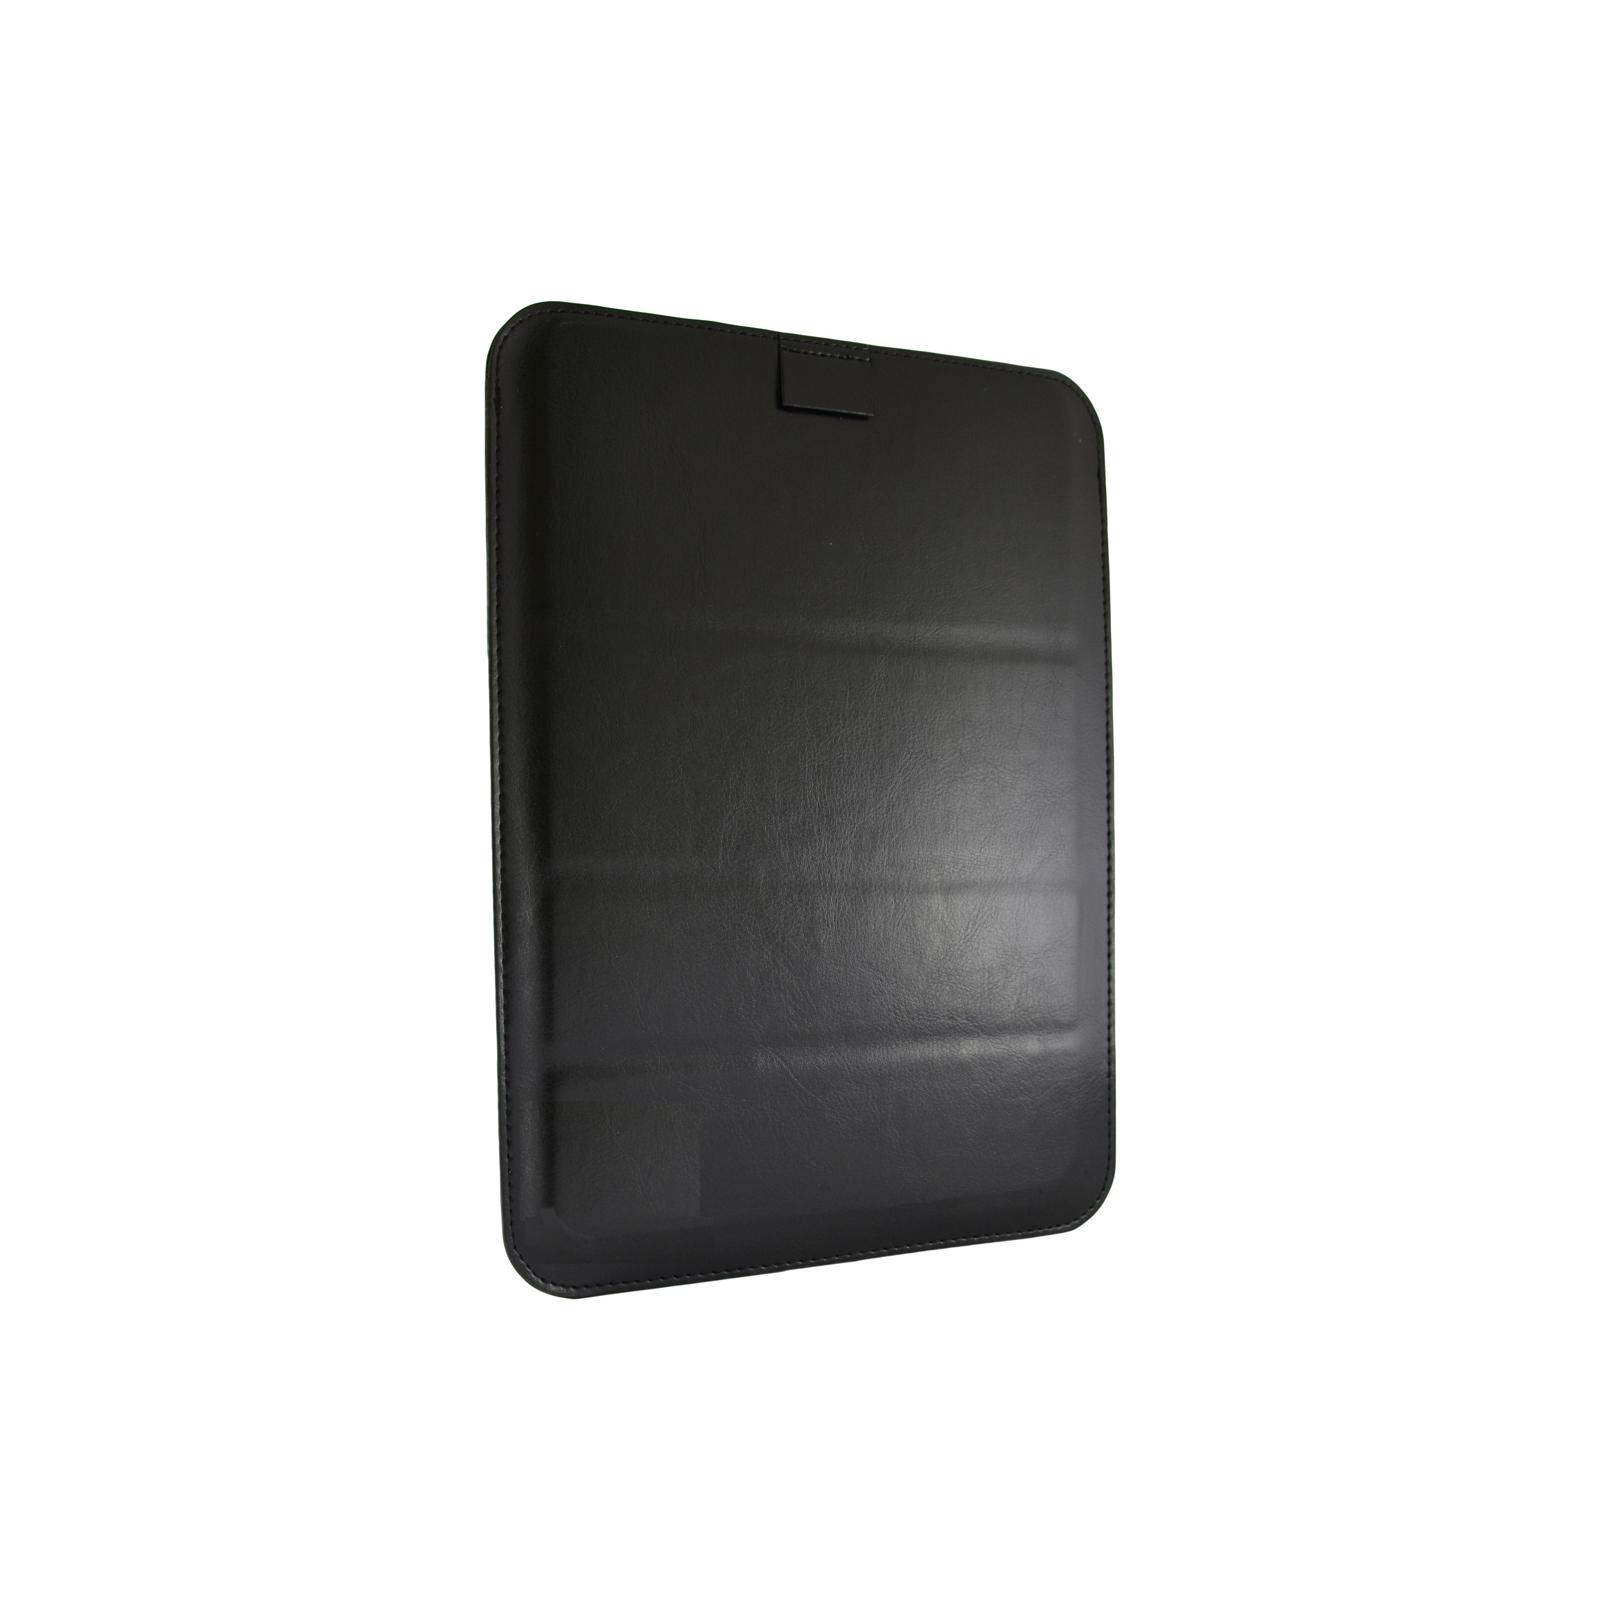 "Чехол для планшета Pro-case 10,1"" Универсальный 10,1"" pouch black (UN101Pouch)"